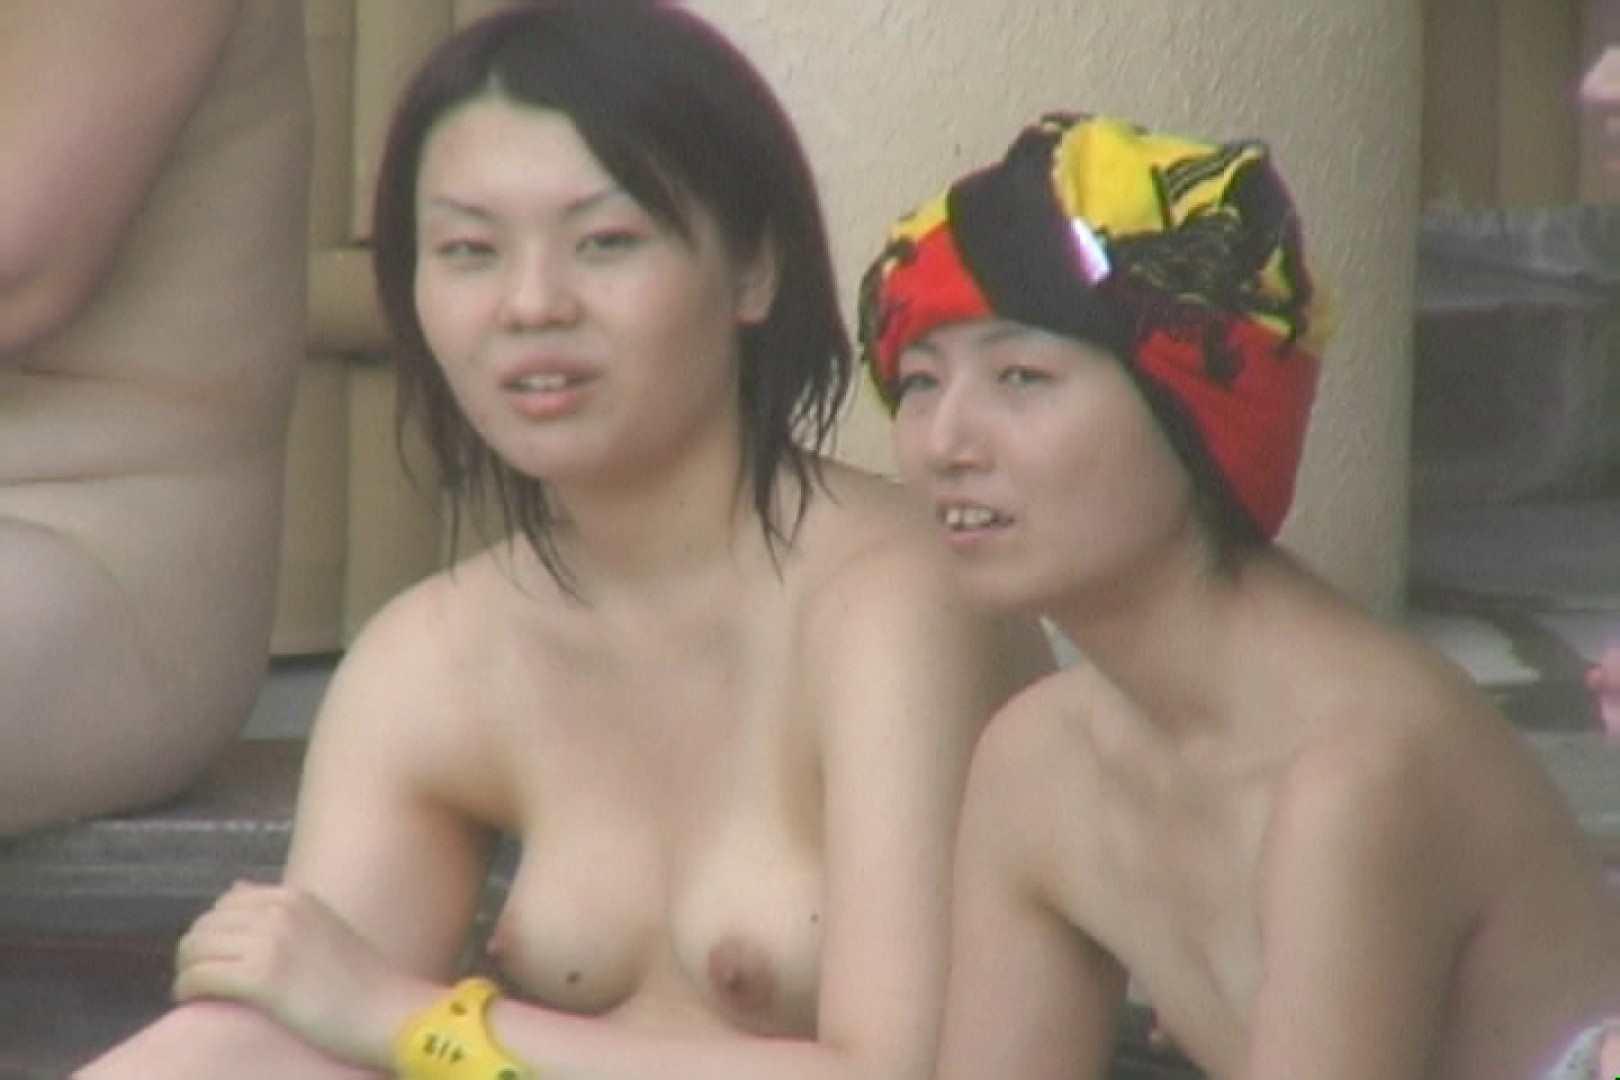 Aquaな露天風呂Vol.61【VIP限定】 OLセックス   盗撮  72画像 70